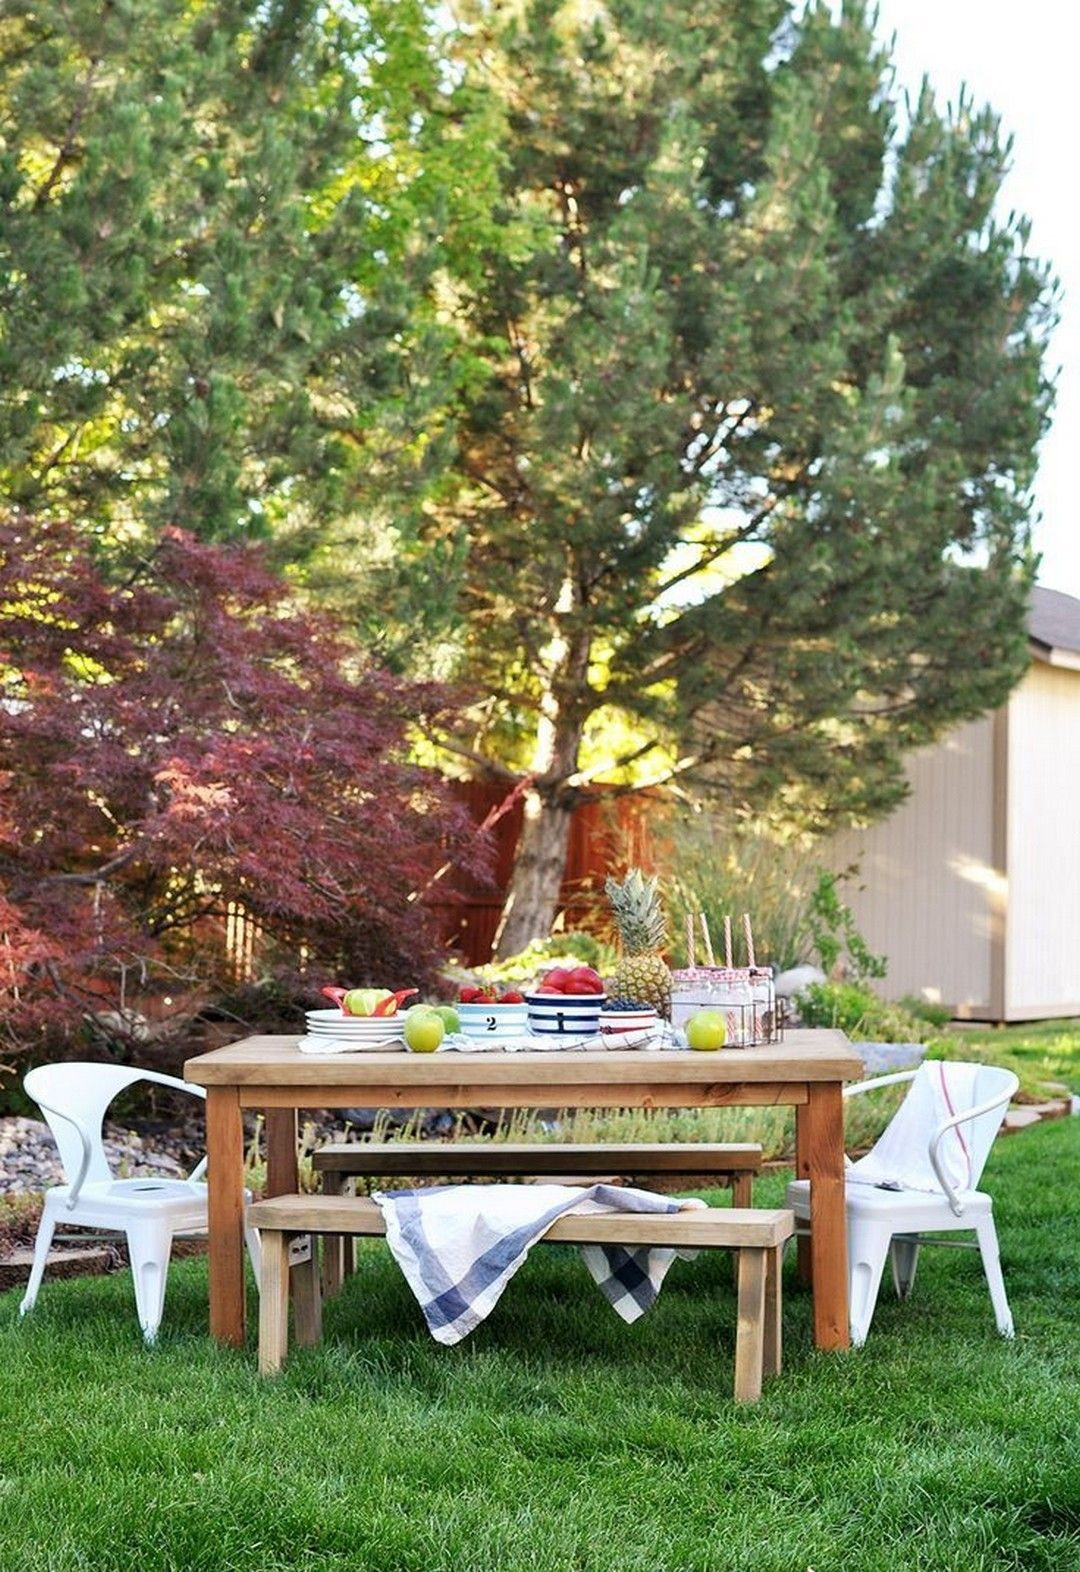 24 Creative Ideas to Make an Outdoor Oasis for Kids this Summer #projekteimfreien